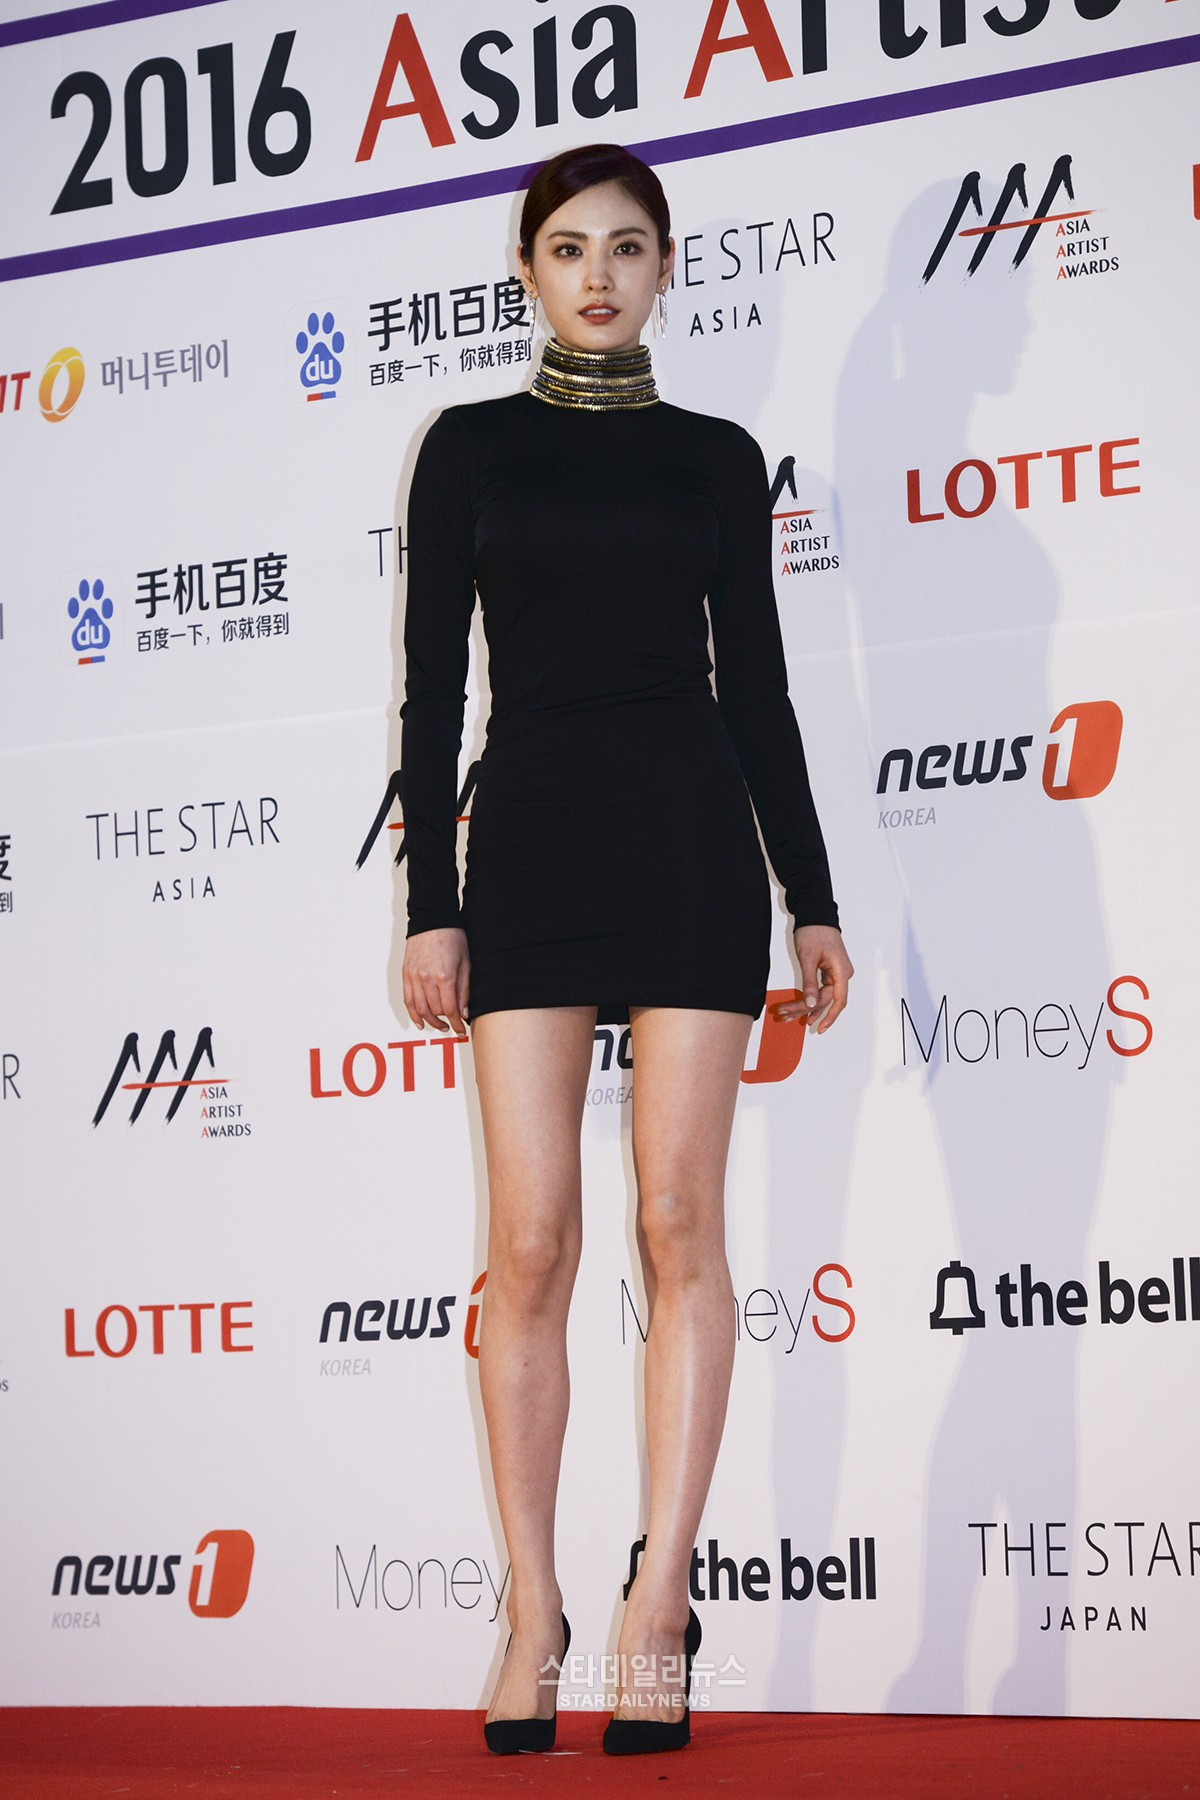 K Pop And K Drama Stars Shine At 2016 Asia Artist Awards